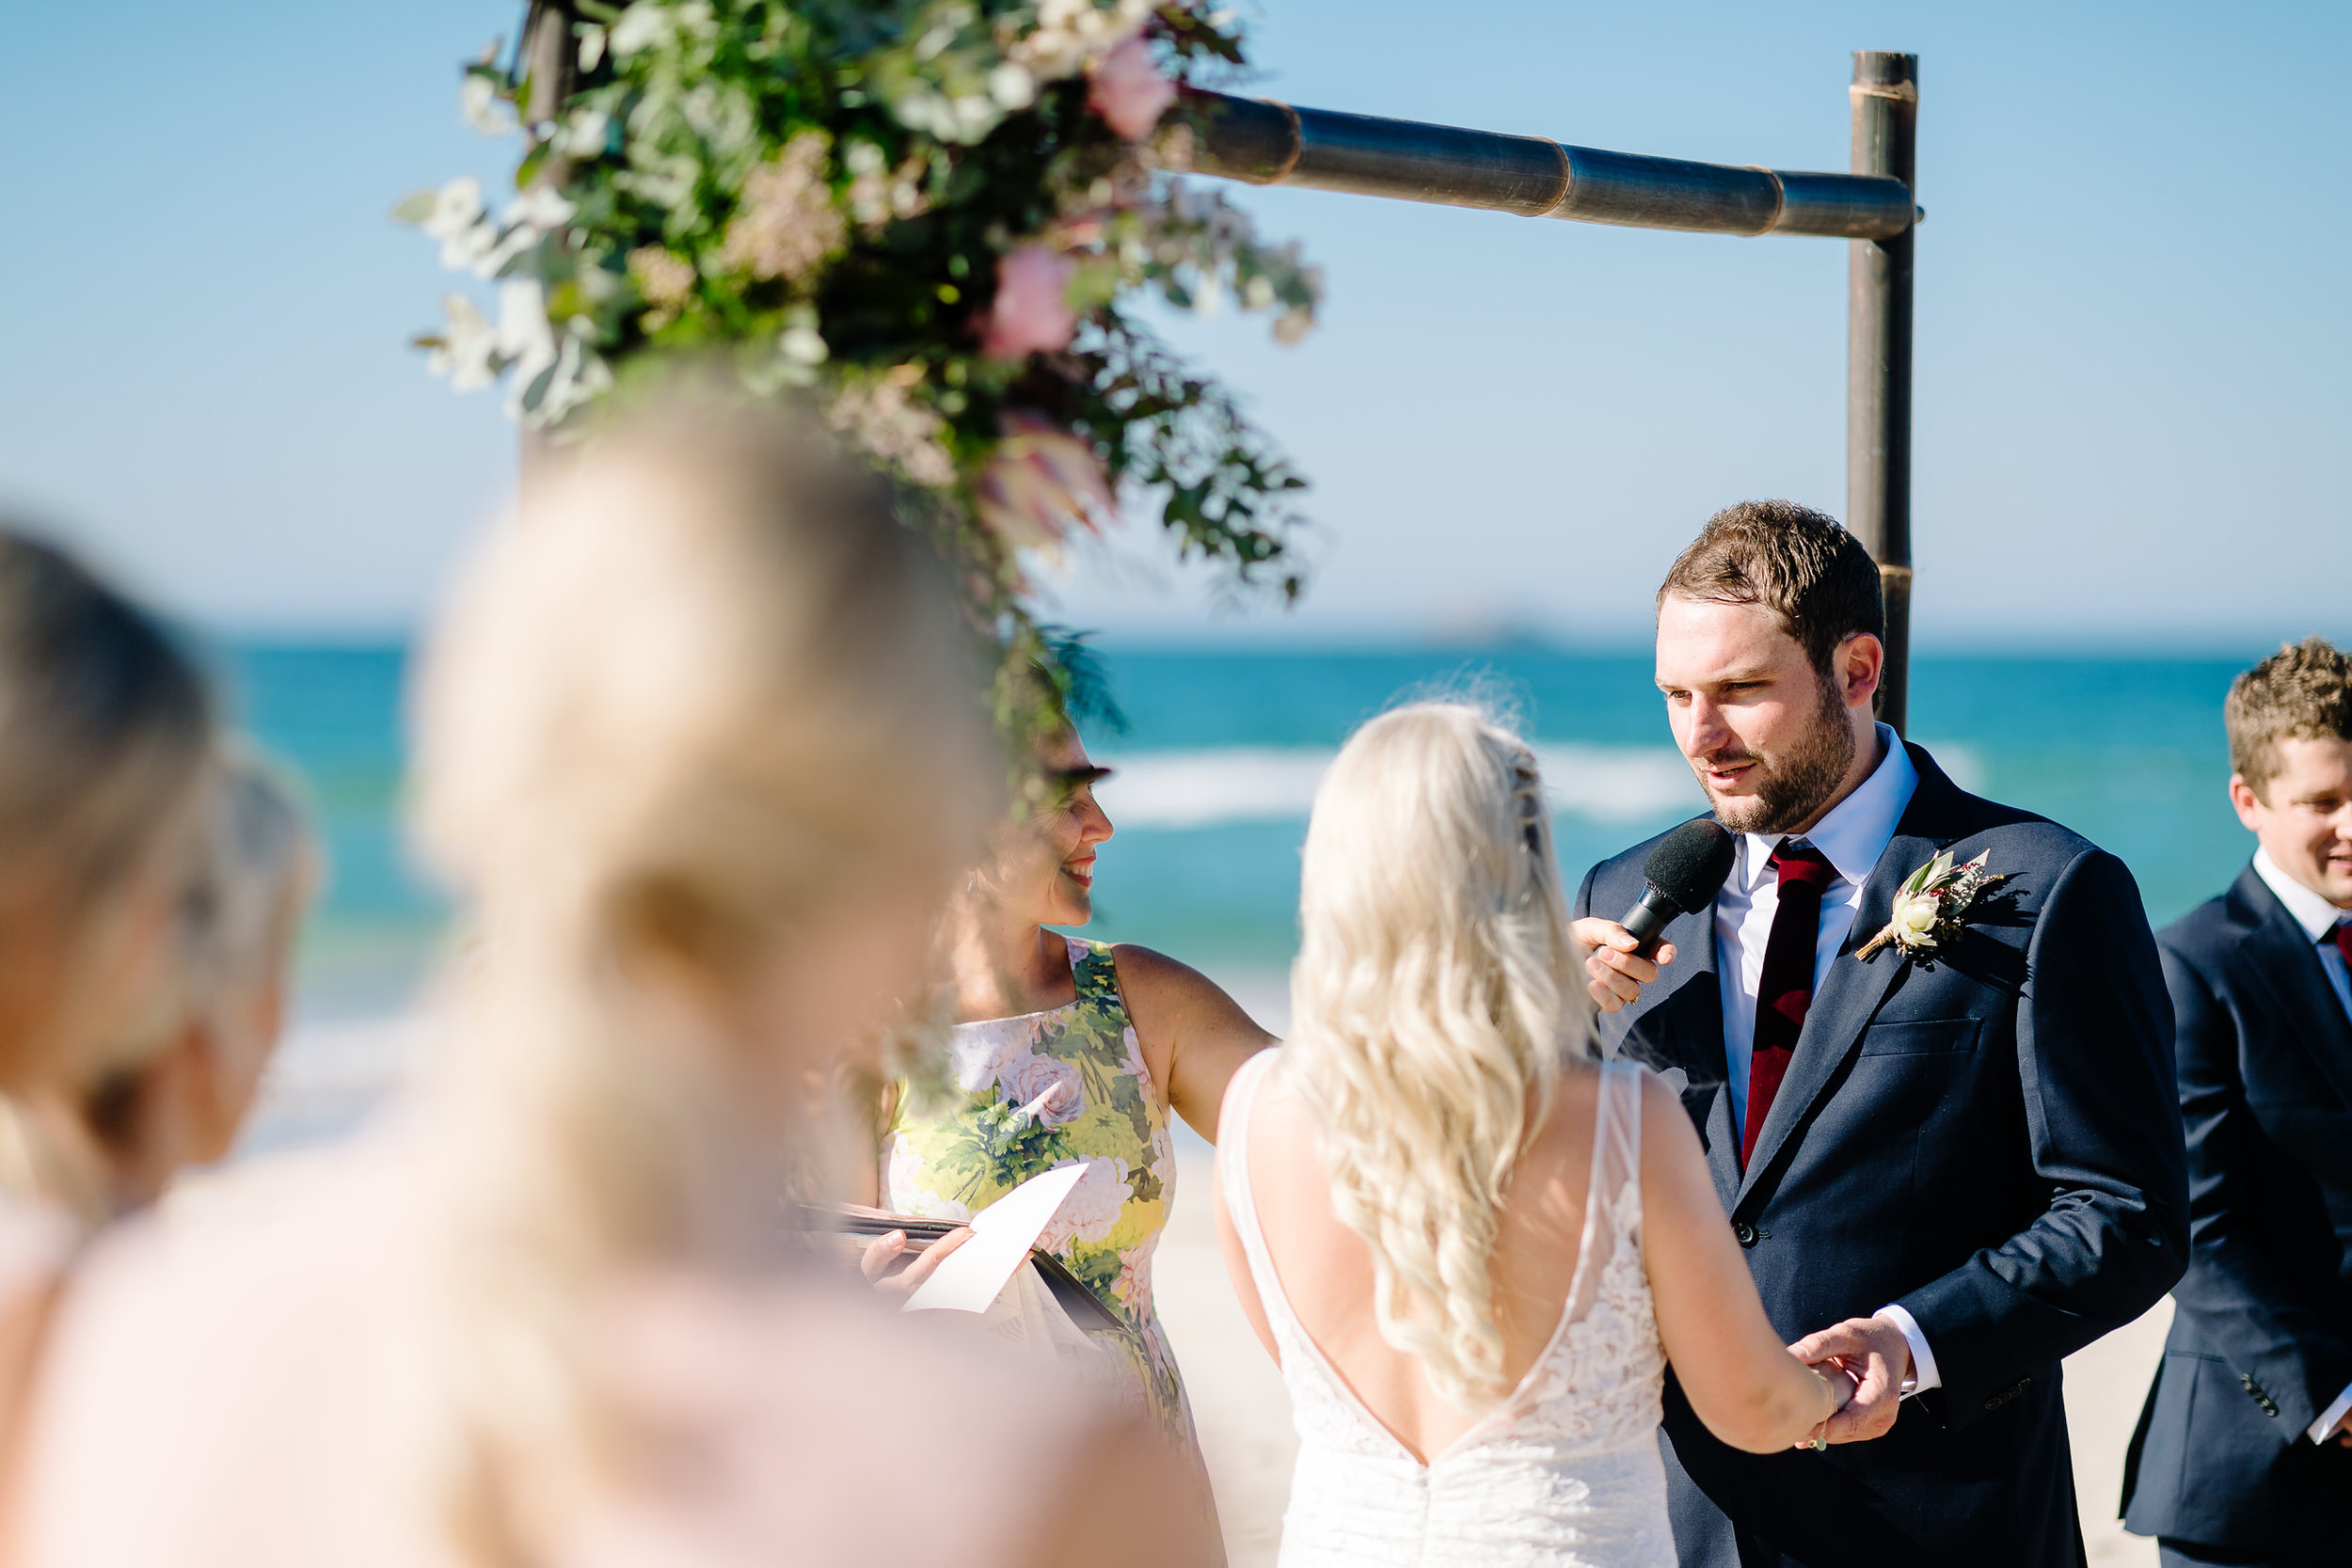 Justin_And_Jim_Photography_Byron_Bay_Wedding049.JPG